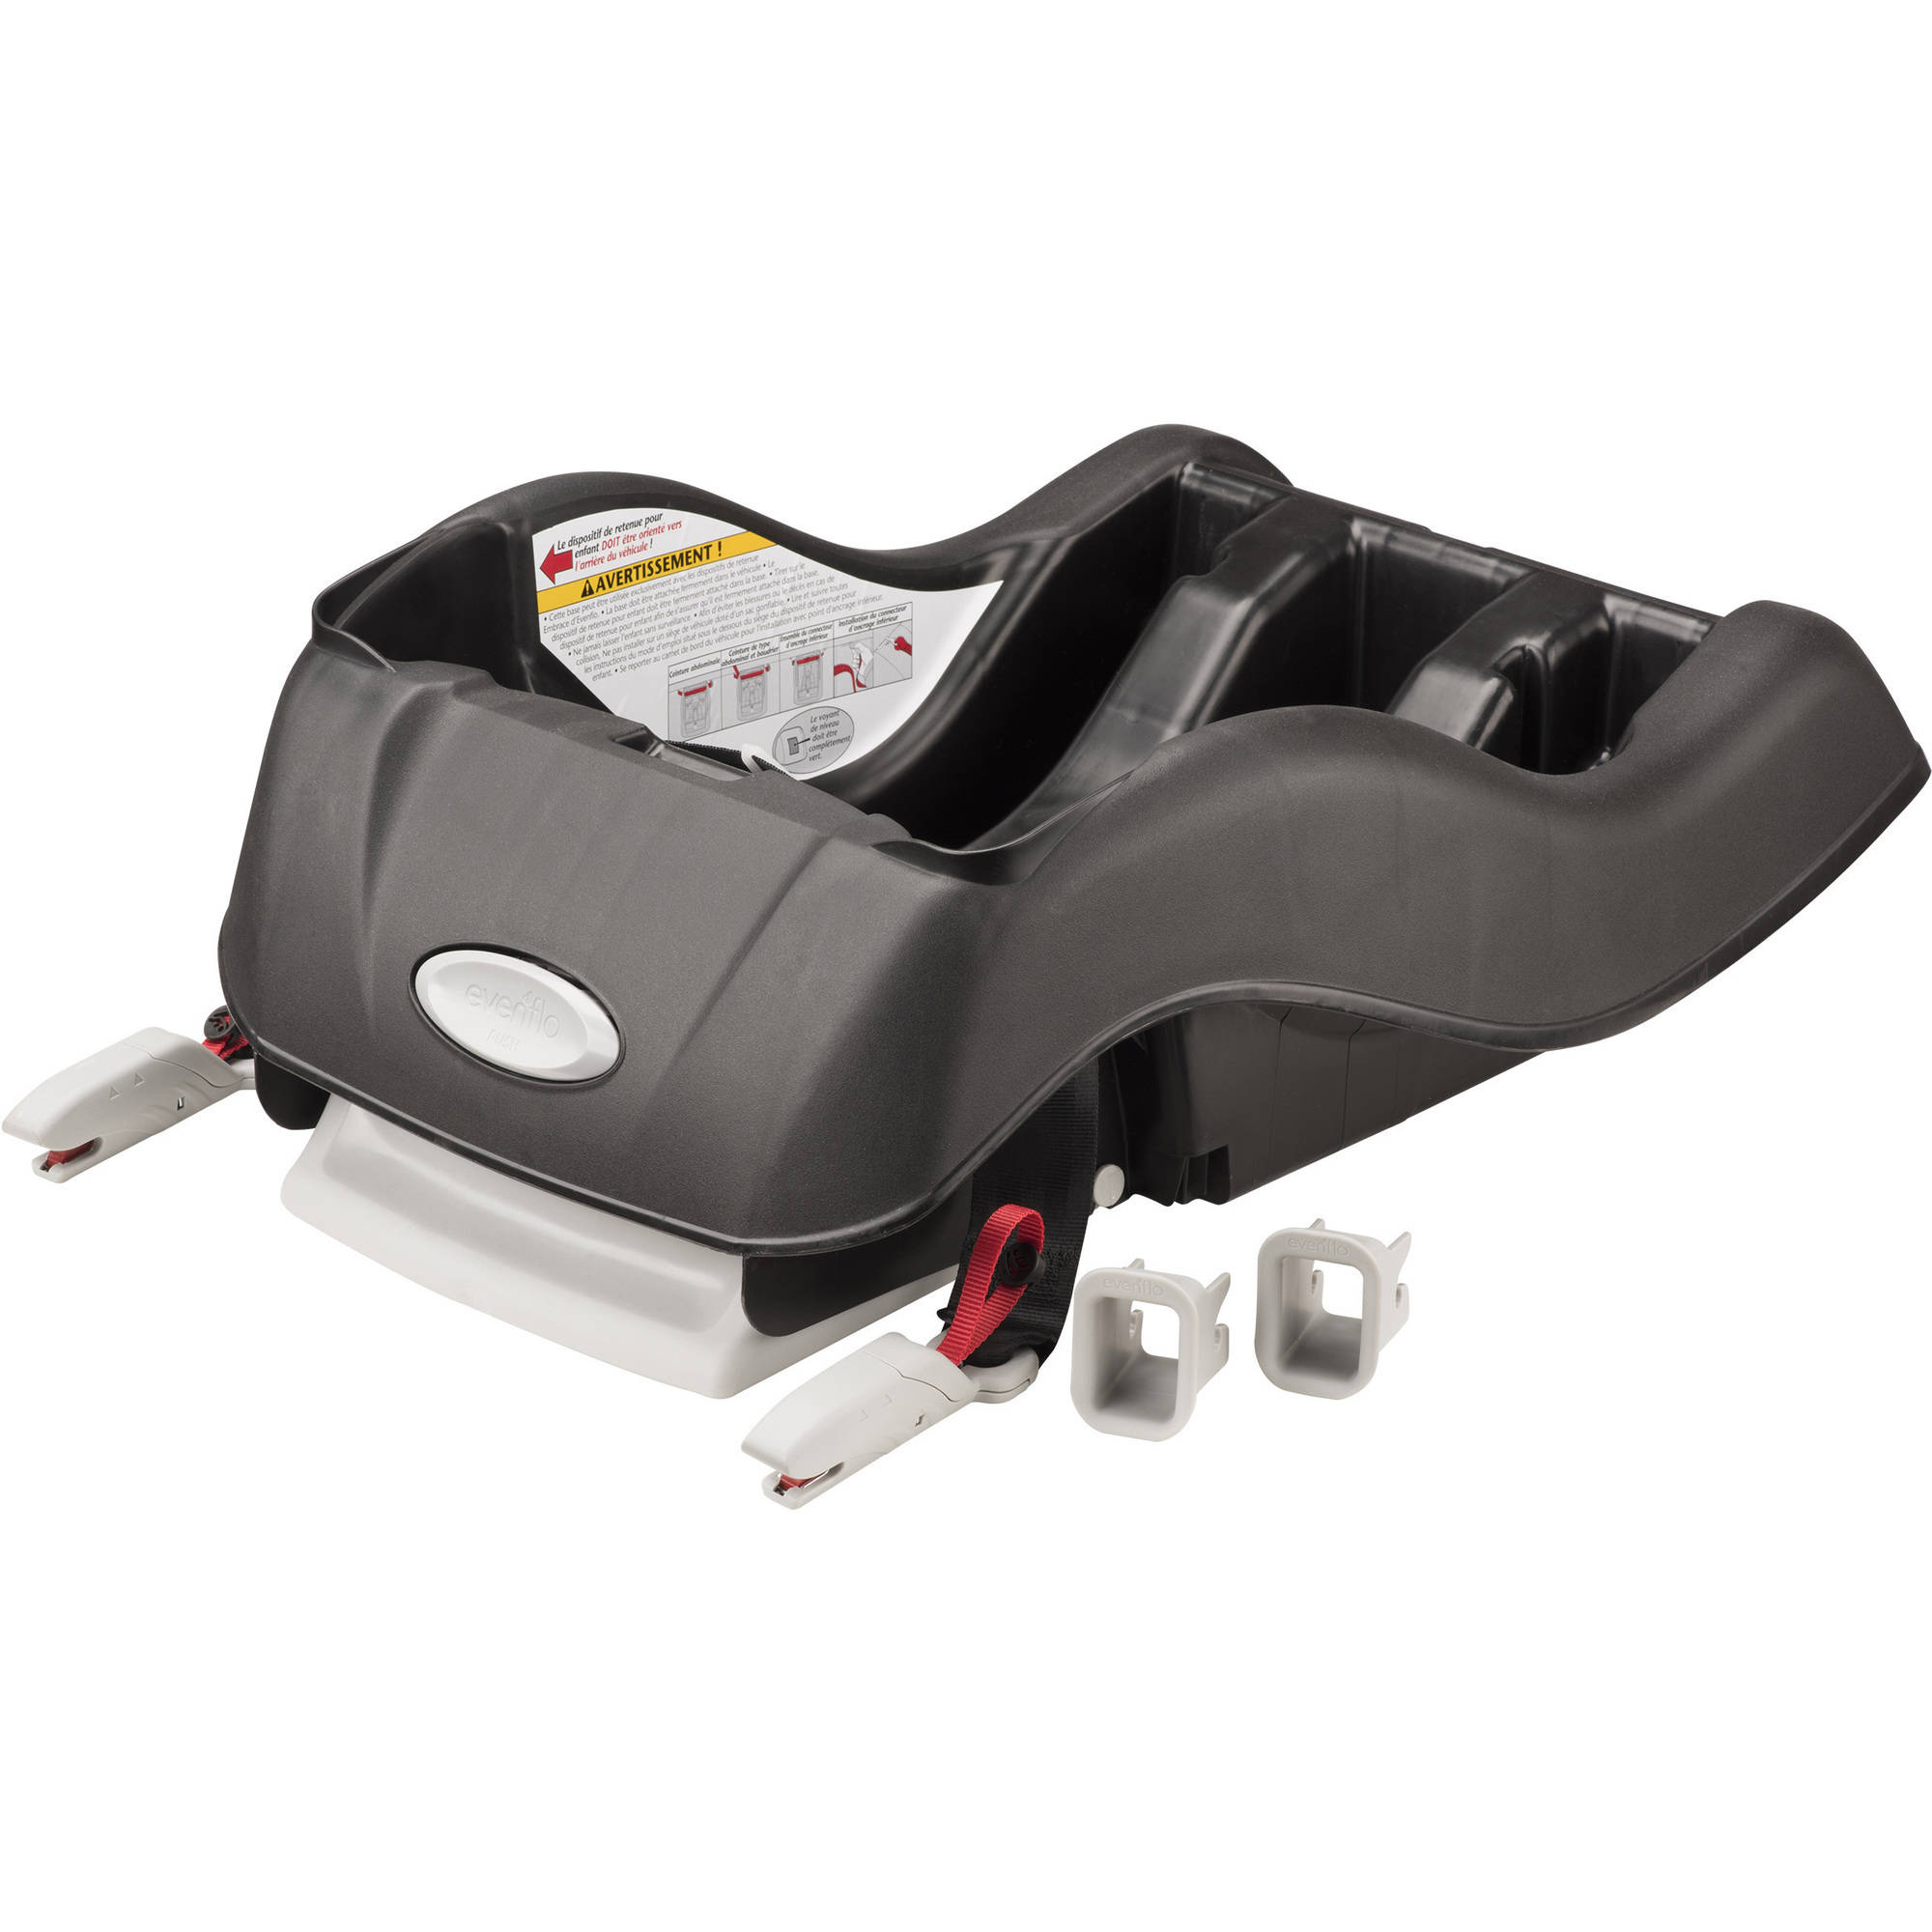 Evenflo Car Seat Base Installation